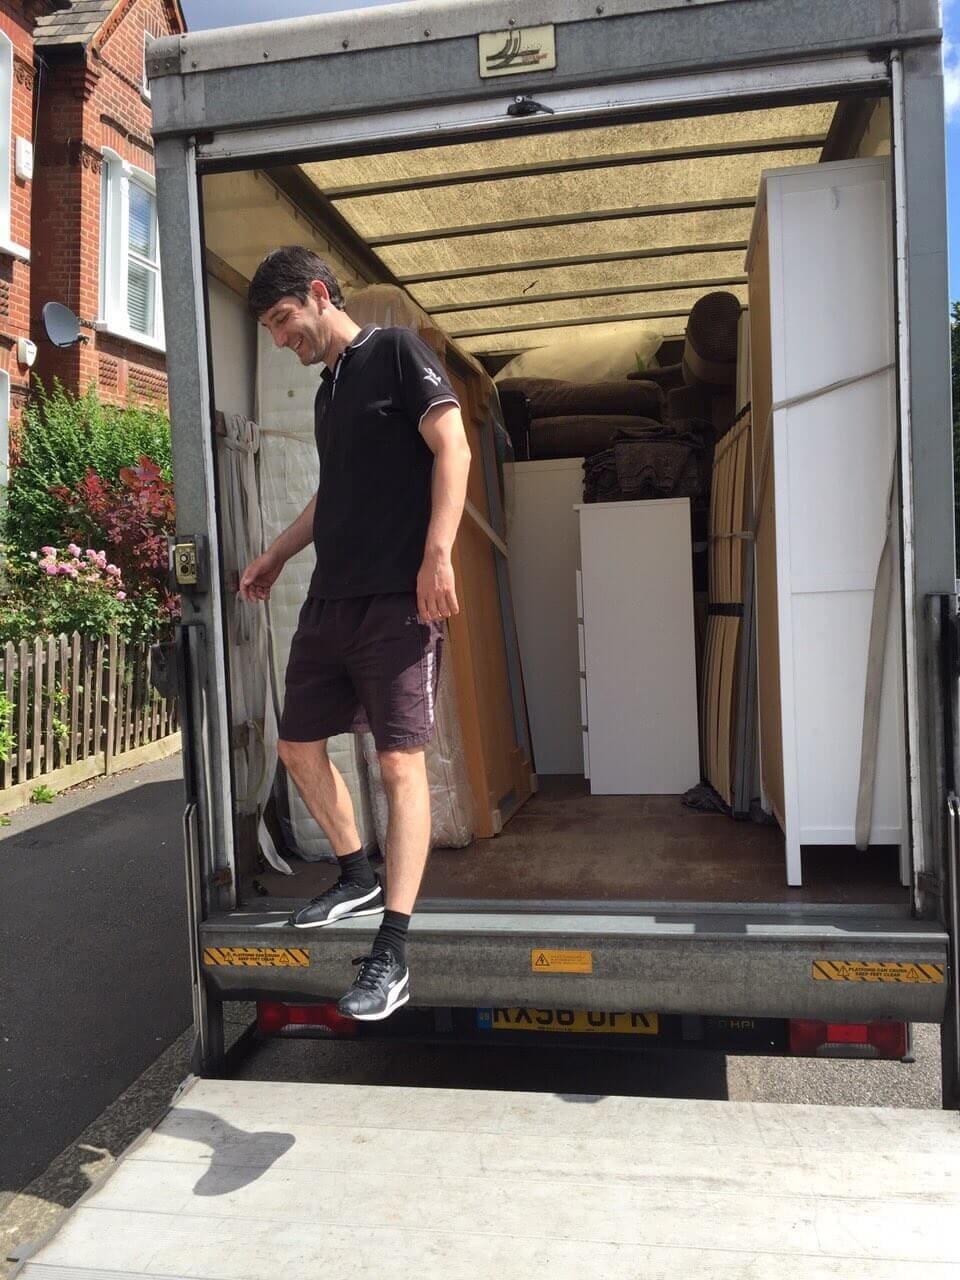 Lambeth van with man SE11